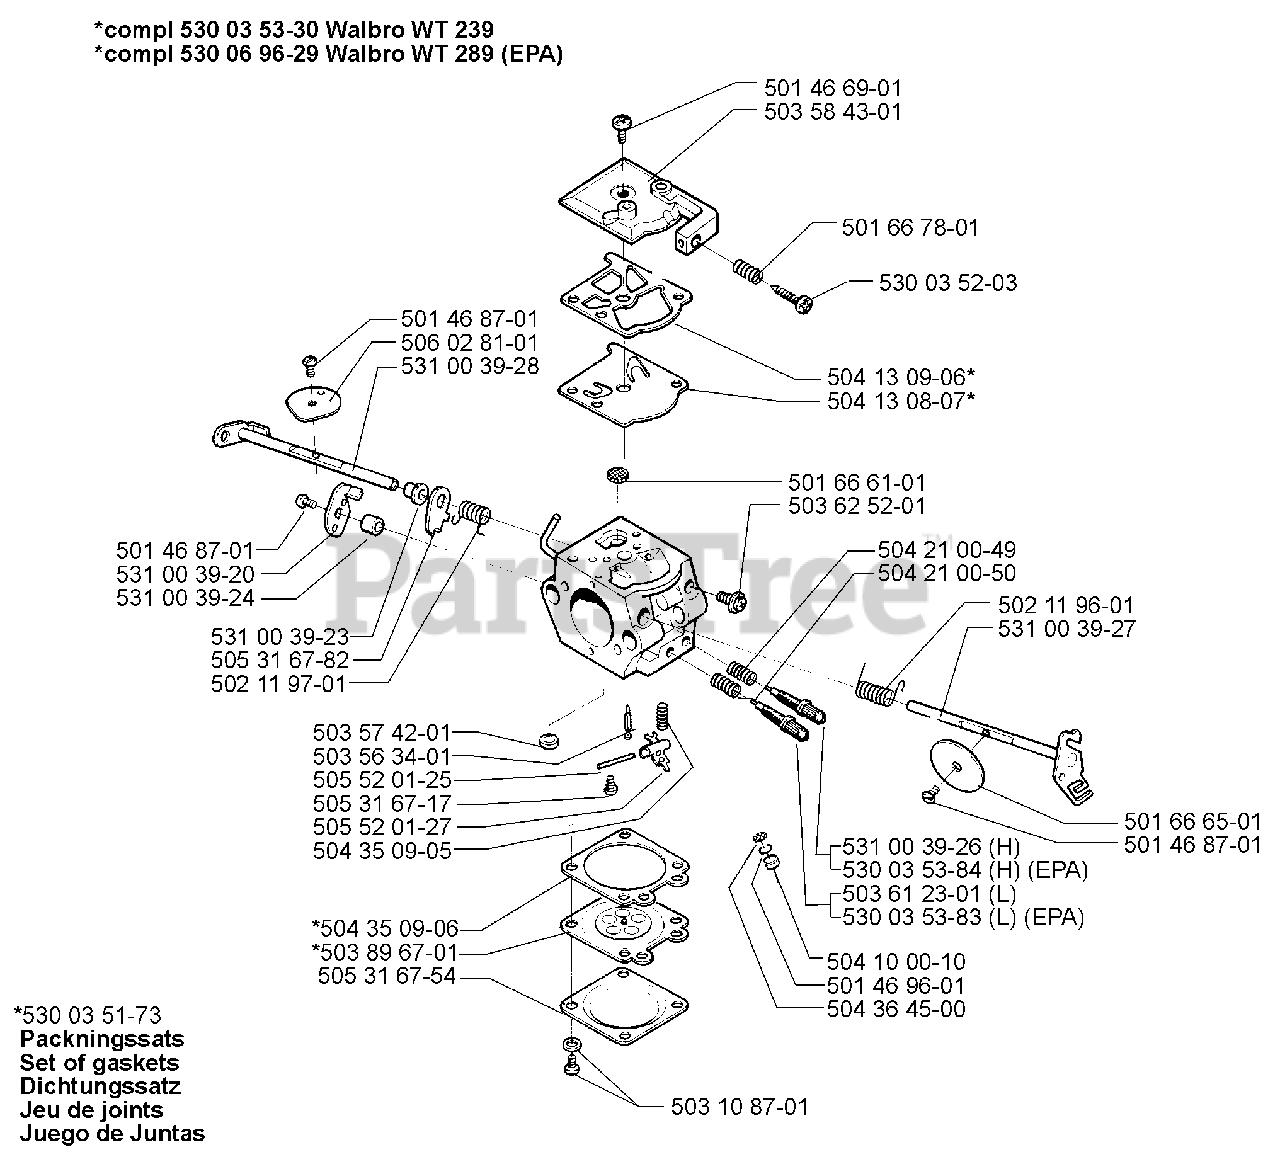 Husqvarna Parts On The Carburetor Parts Walbro Wt 239 239